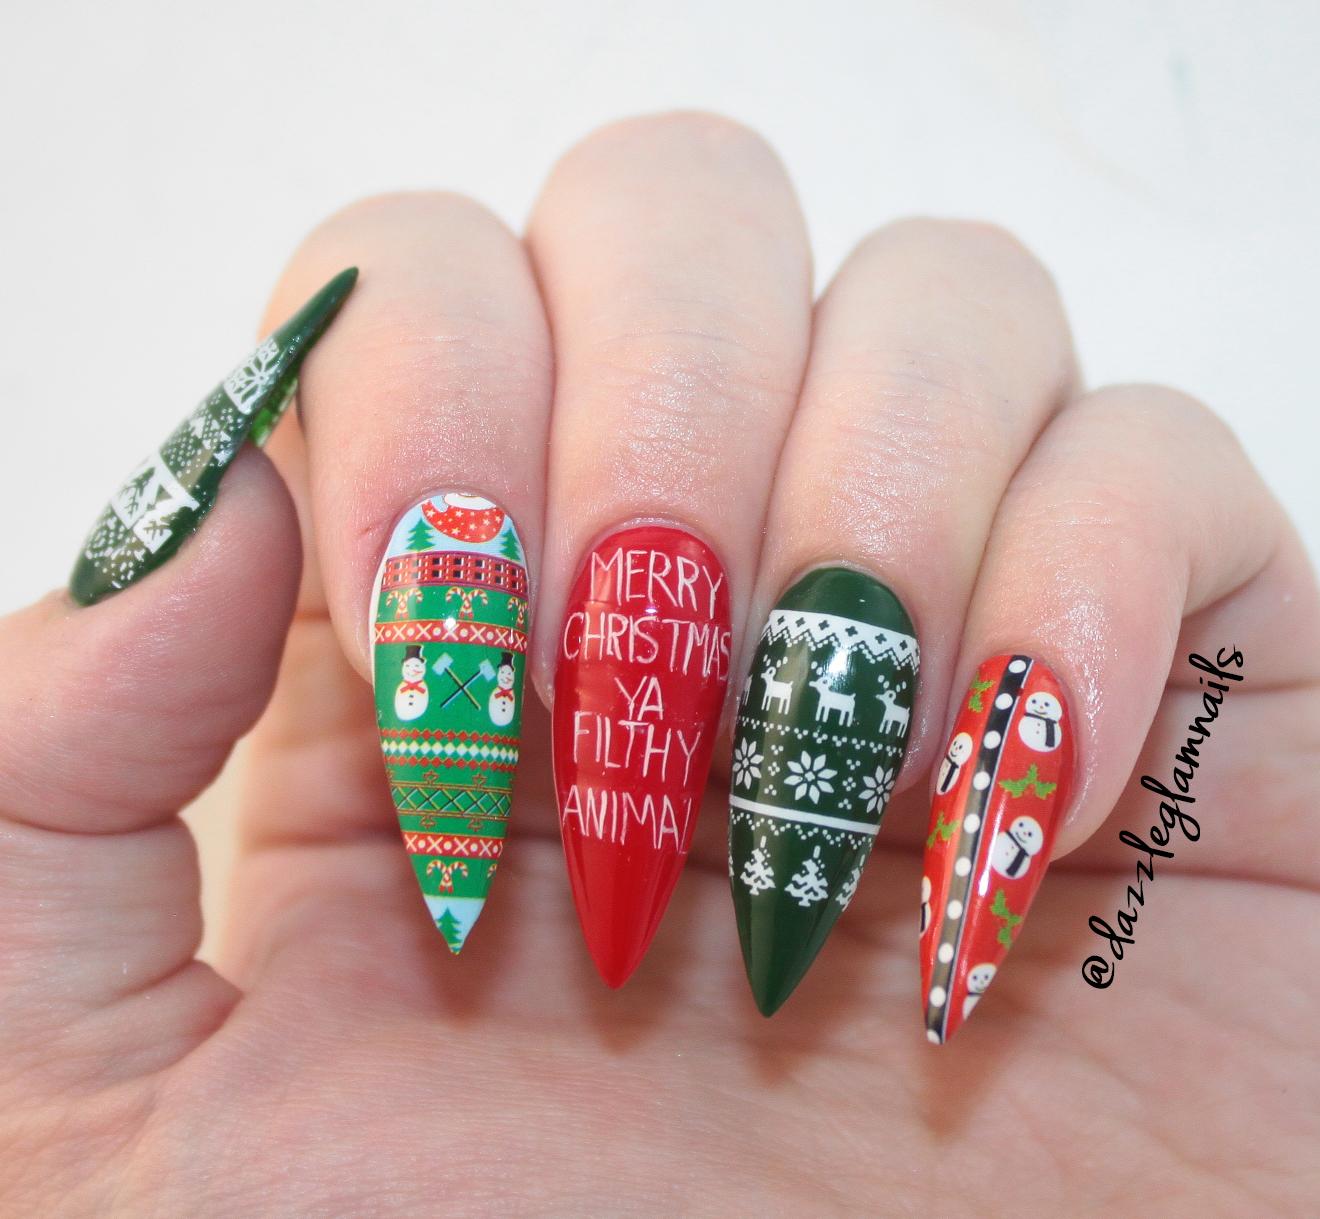 Hand Painted Christmas Nail Art: Dazzle Glam Nails